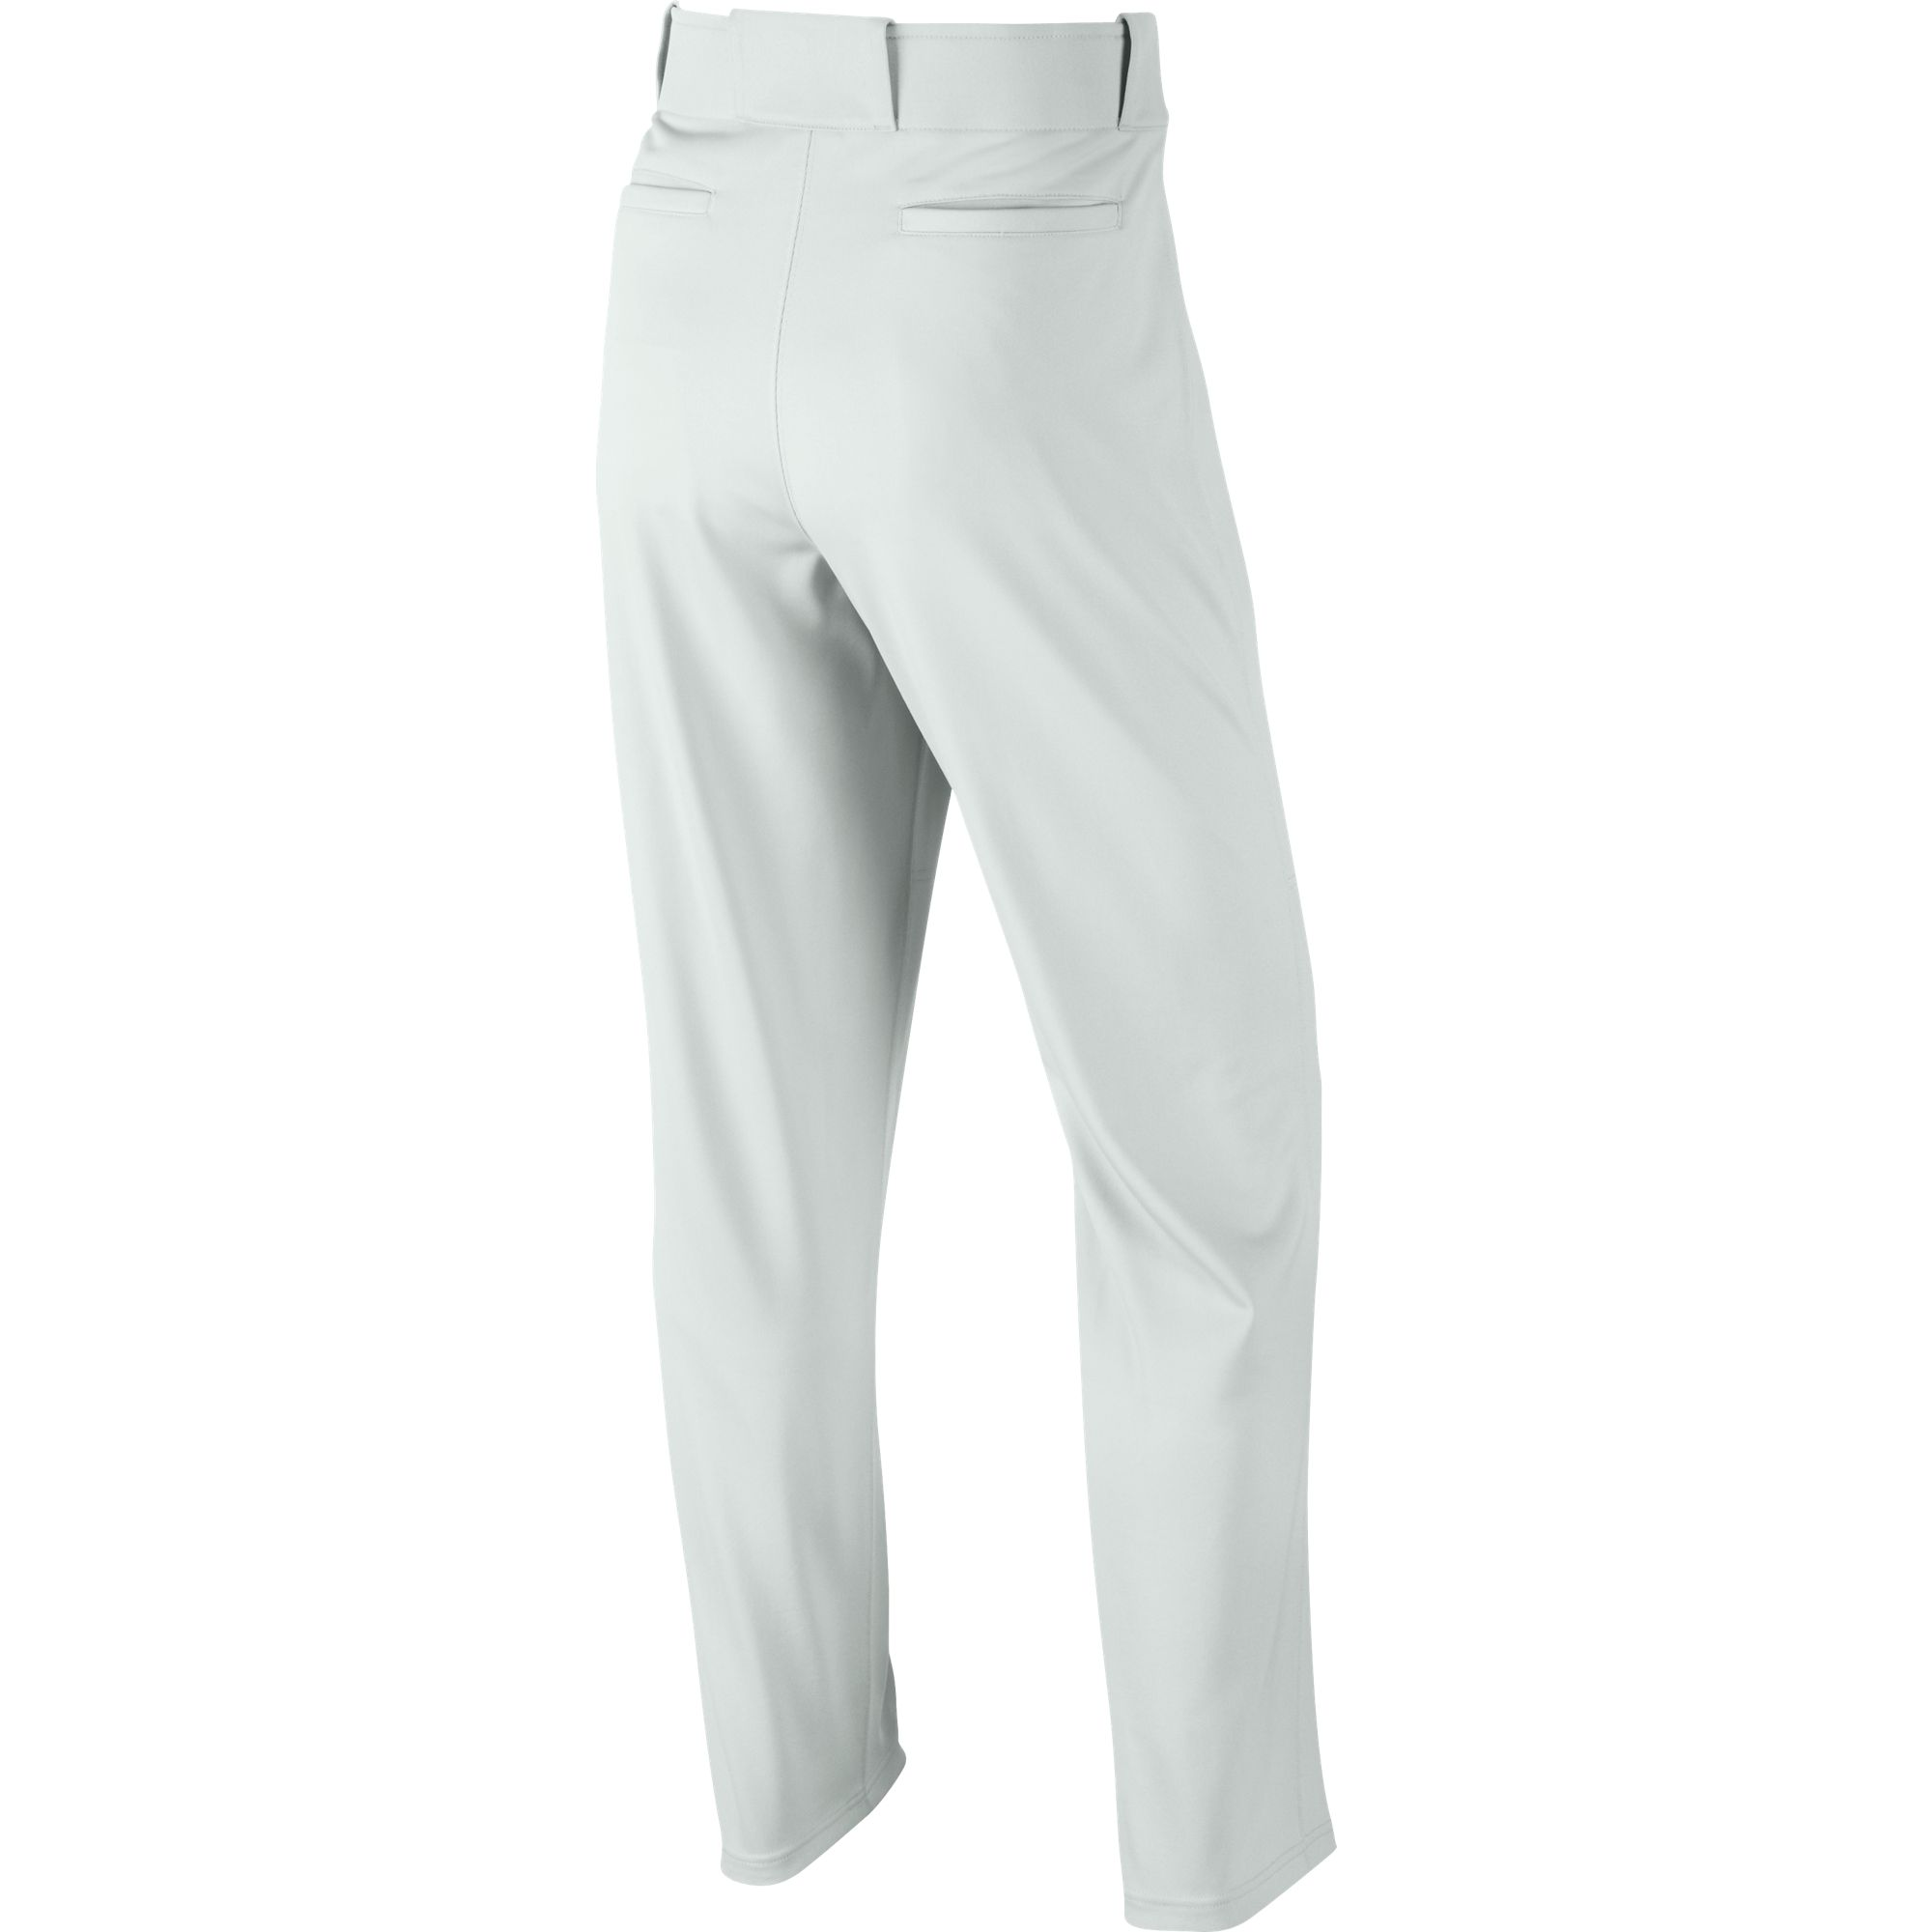 Men's  Core DF Open Bottom Baseball Pants, White, swatch